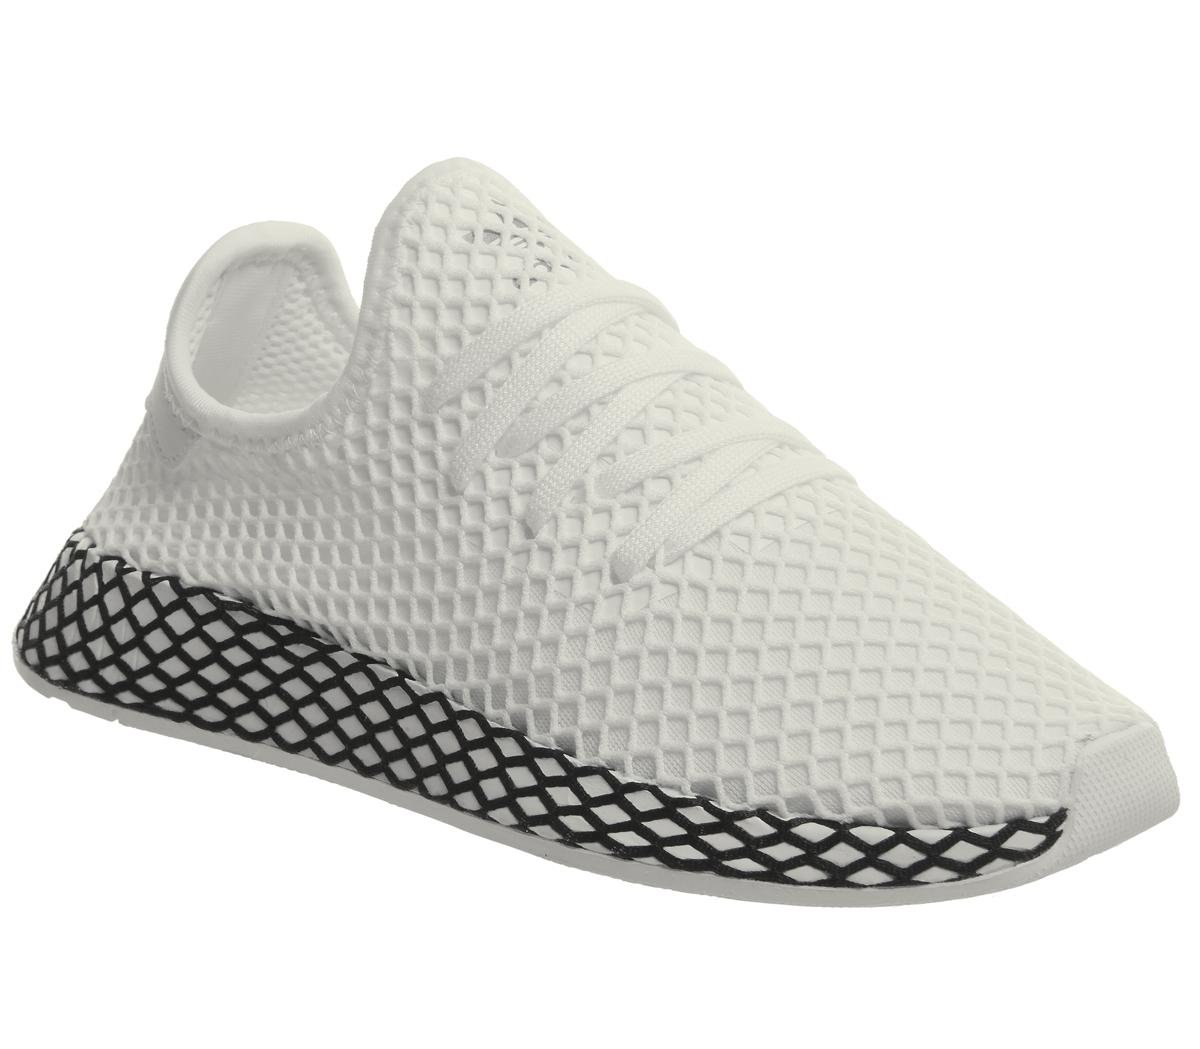 adidas Deerupt Trainers White White